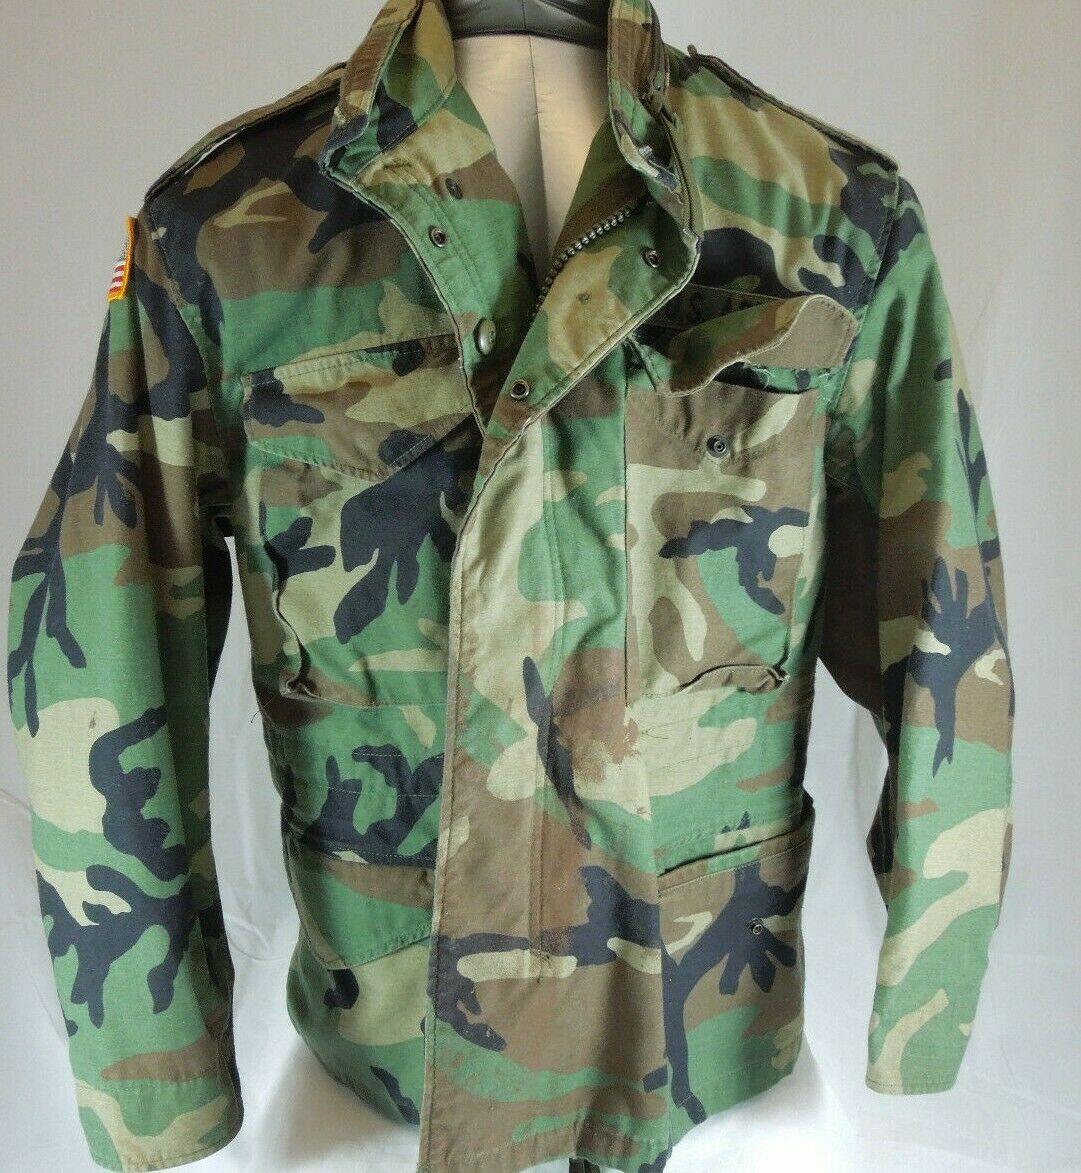 8727d2f09c902 S l1600. S l1600. Previous. US ARMY CAMO JACKET Vntg Mens Green Camouflage  Field Fatigue Medium Extra Short